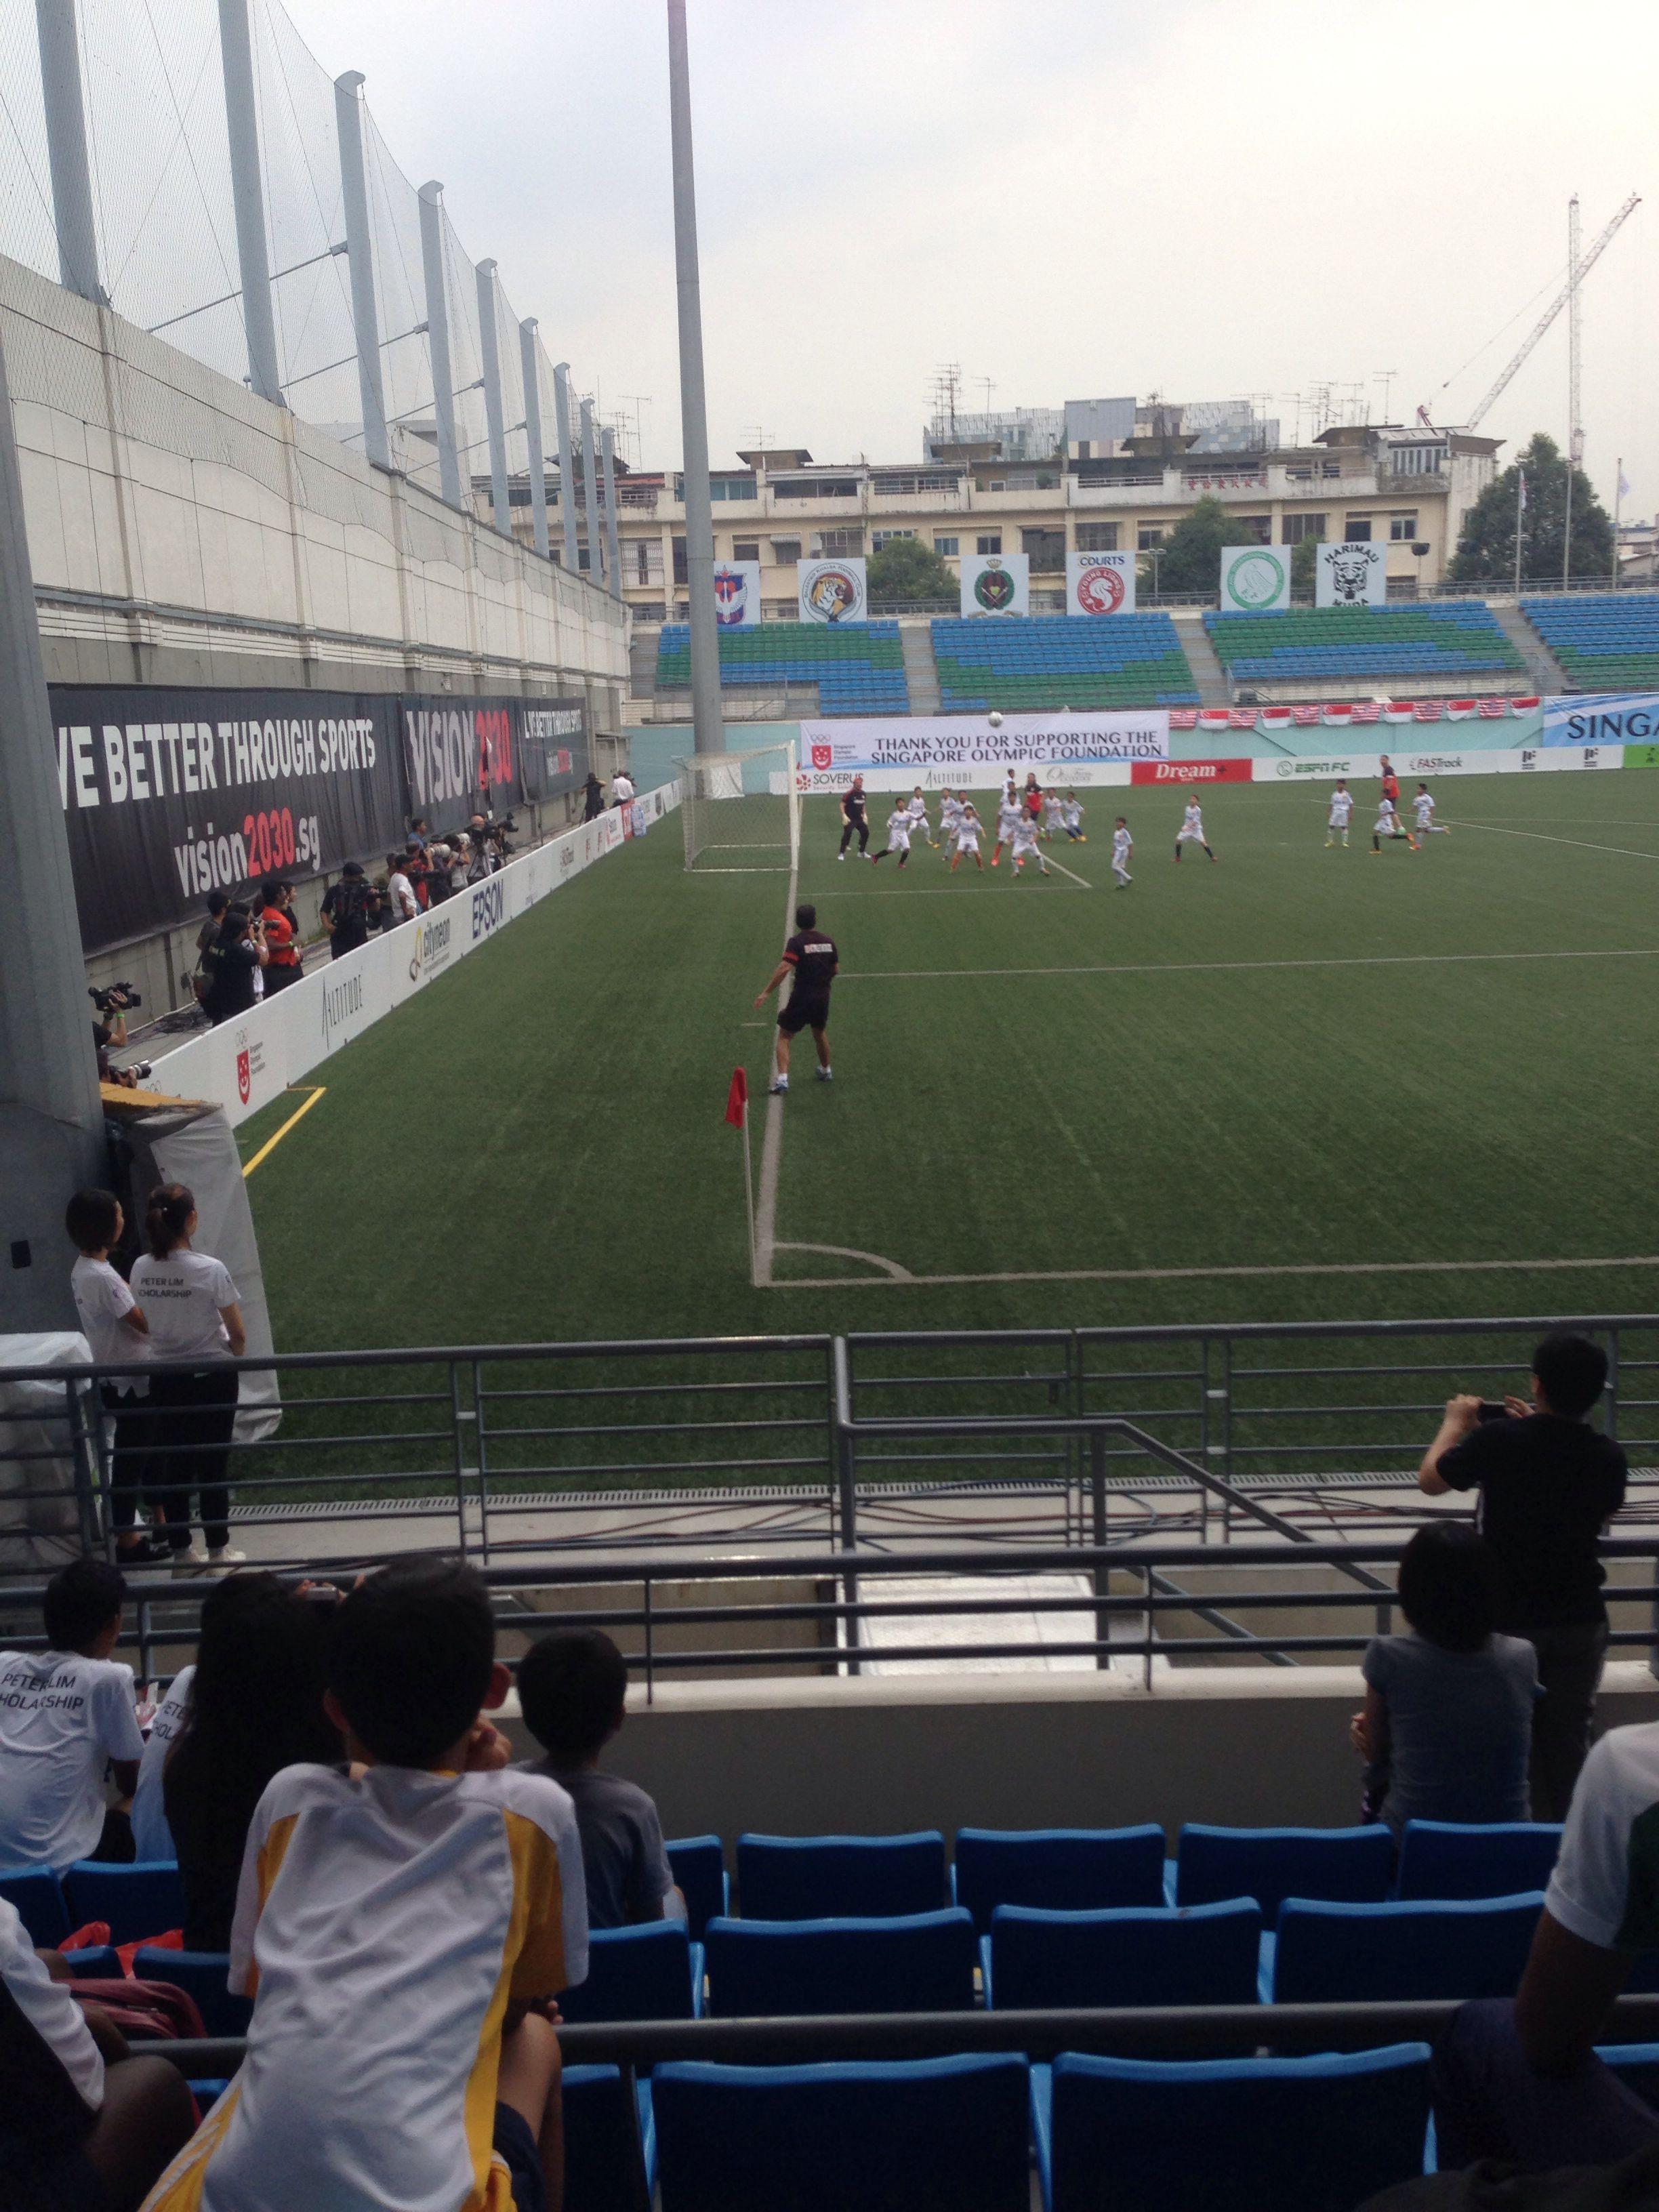 Jalan Besar Stadium Hola Singapore Atletico Madrid V 128 Kids For Charity A Soccer Field Football Soccer